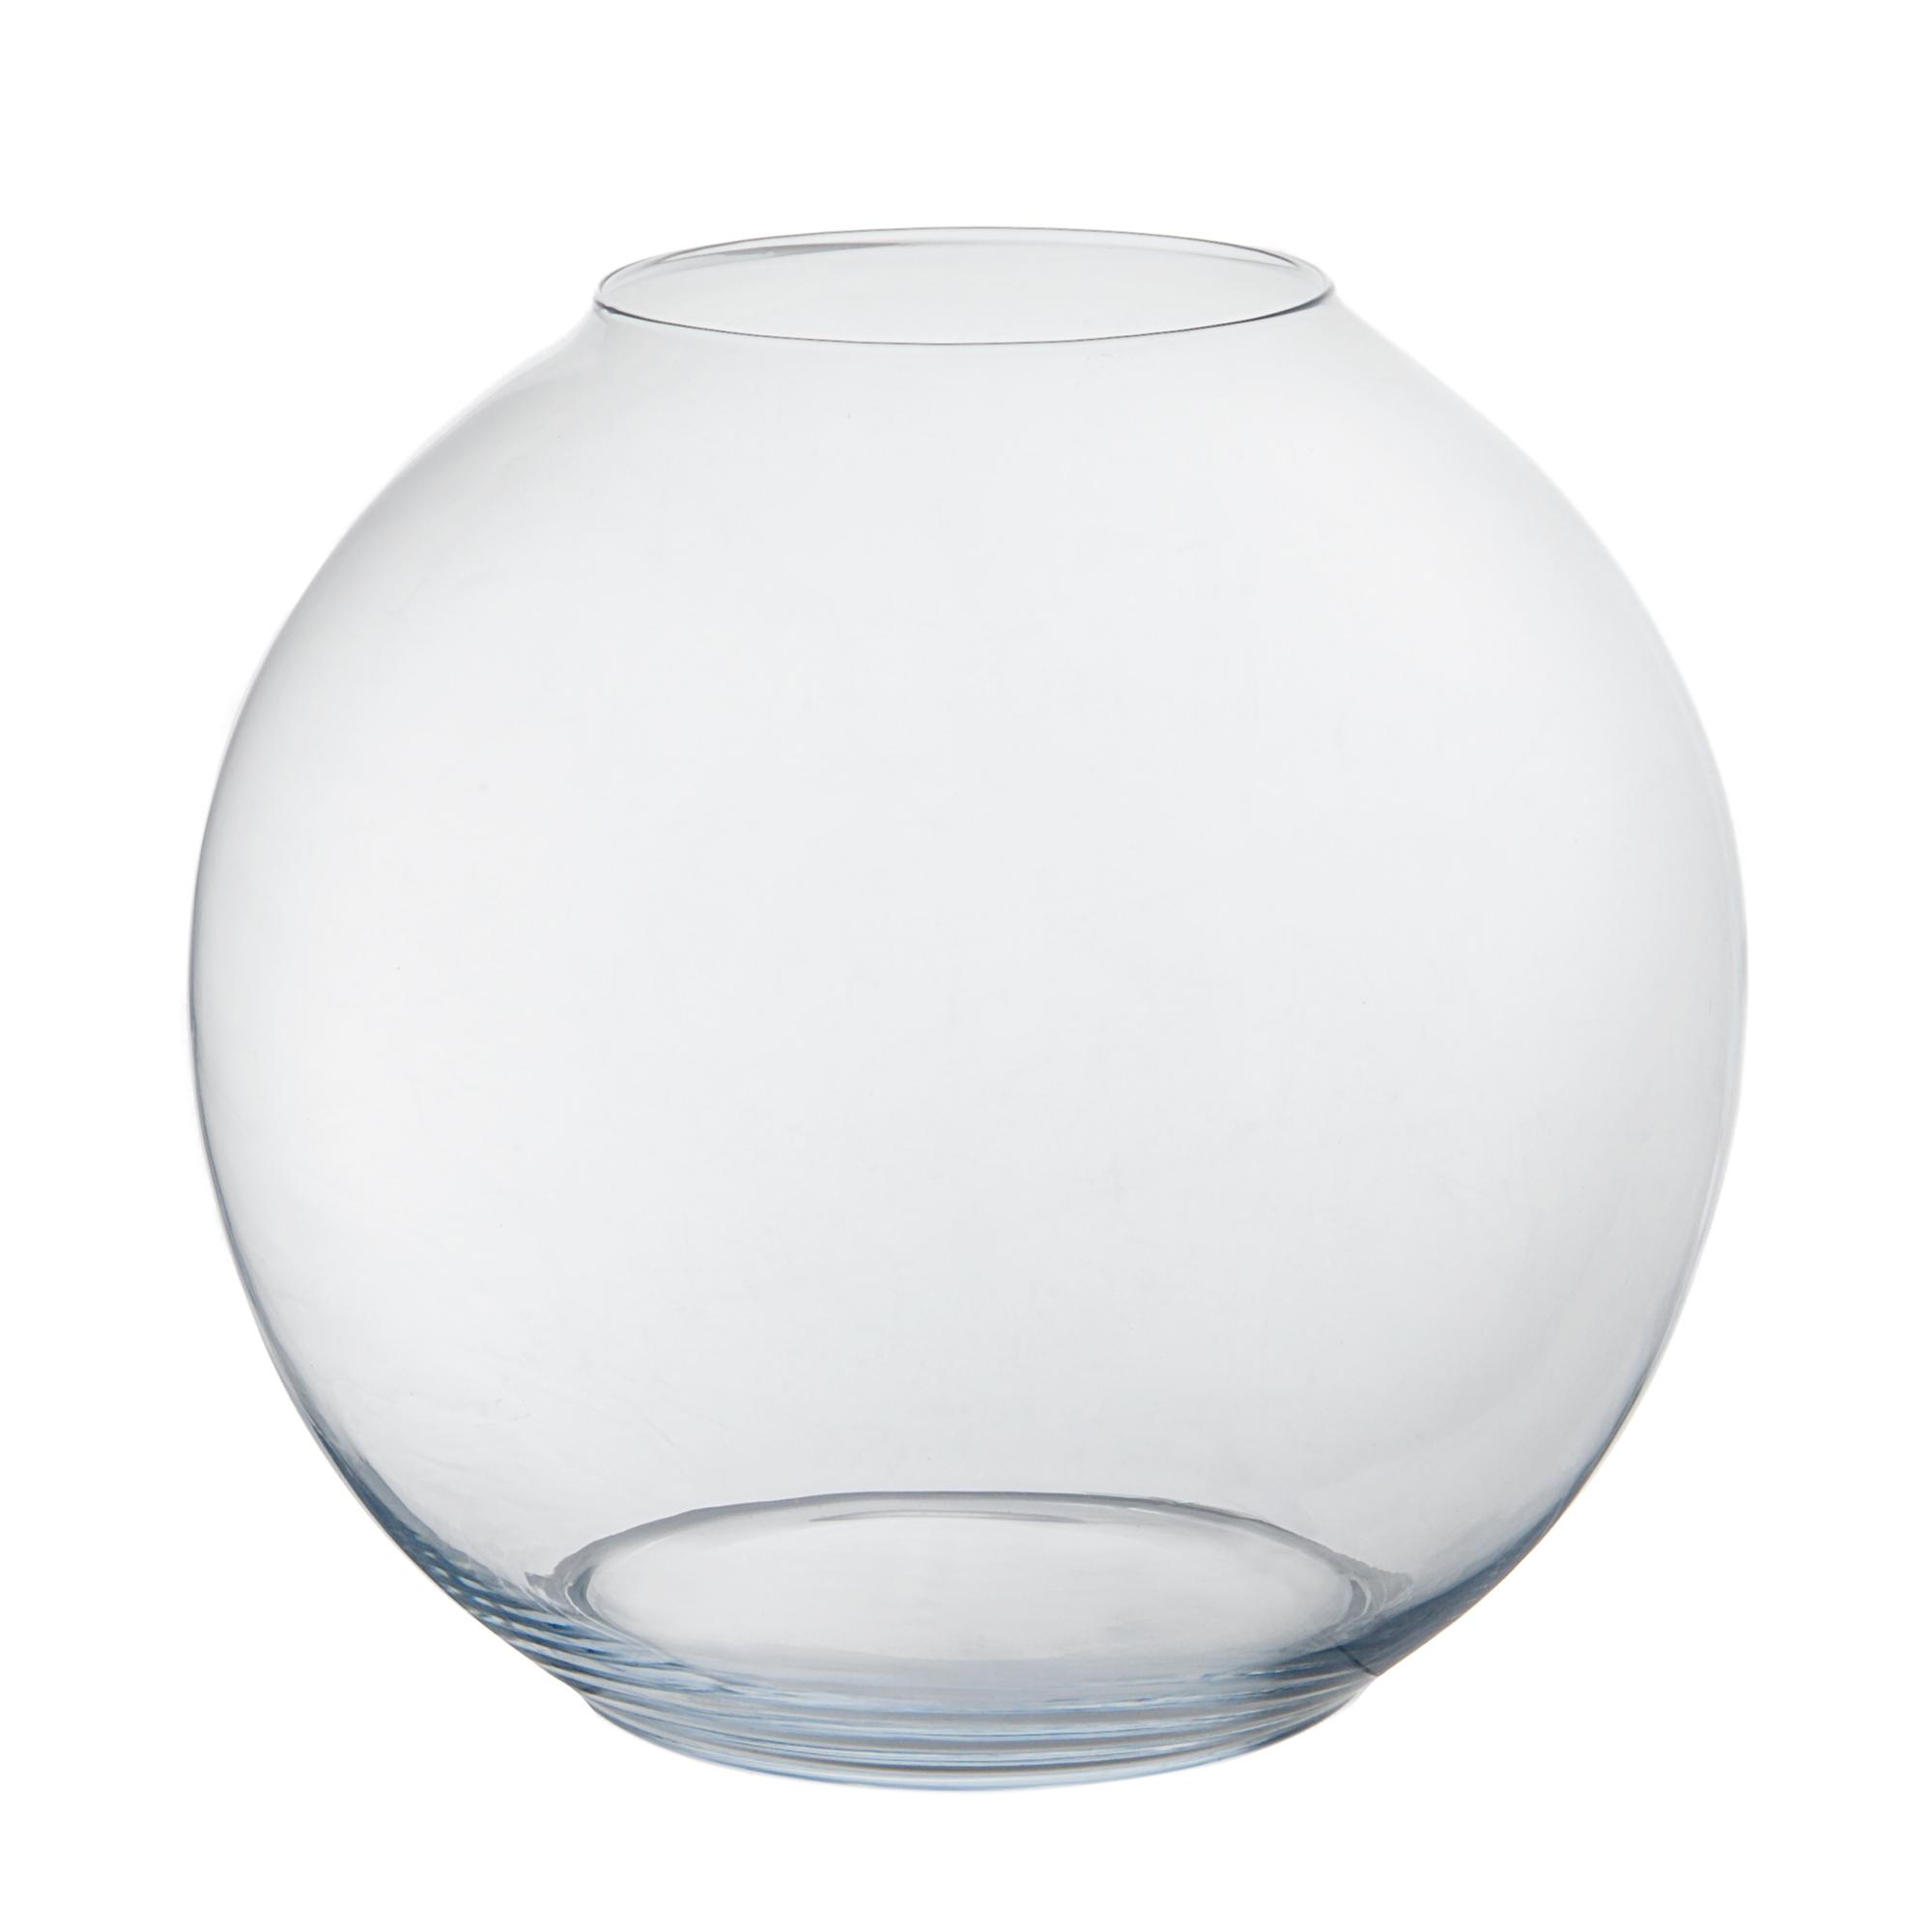 Ваза Hackbijl glass bubble ball 17158